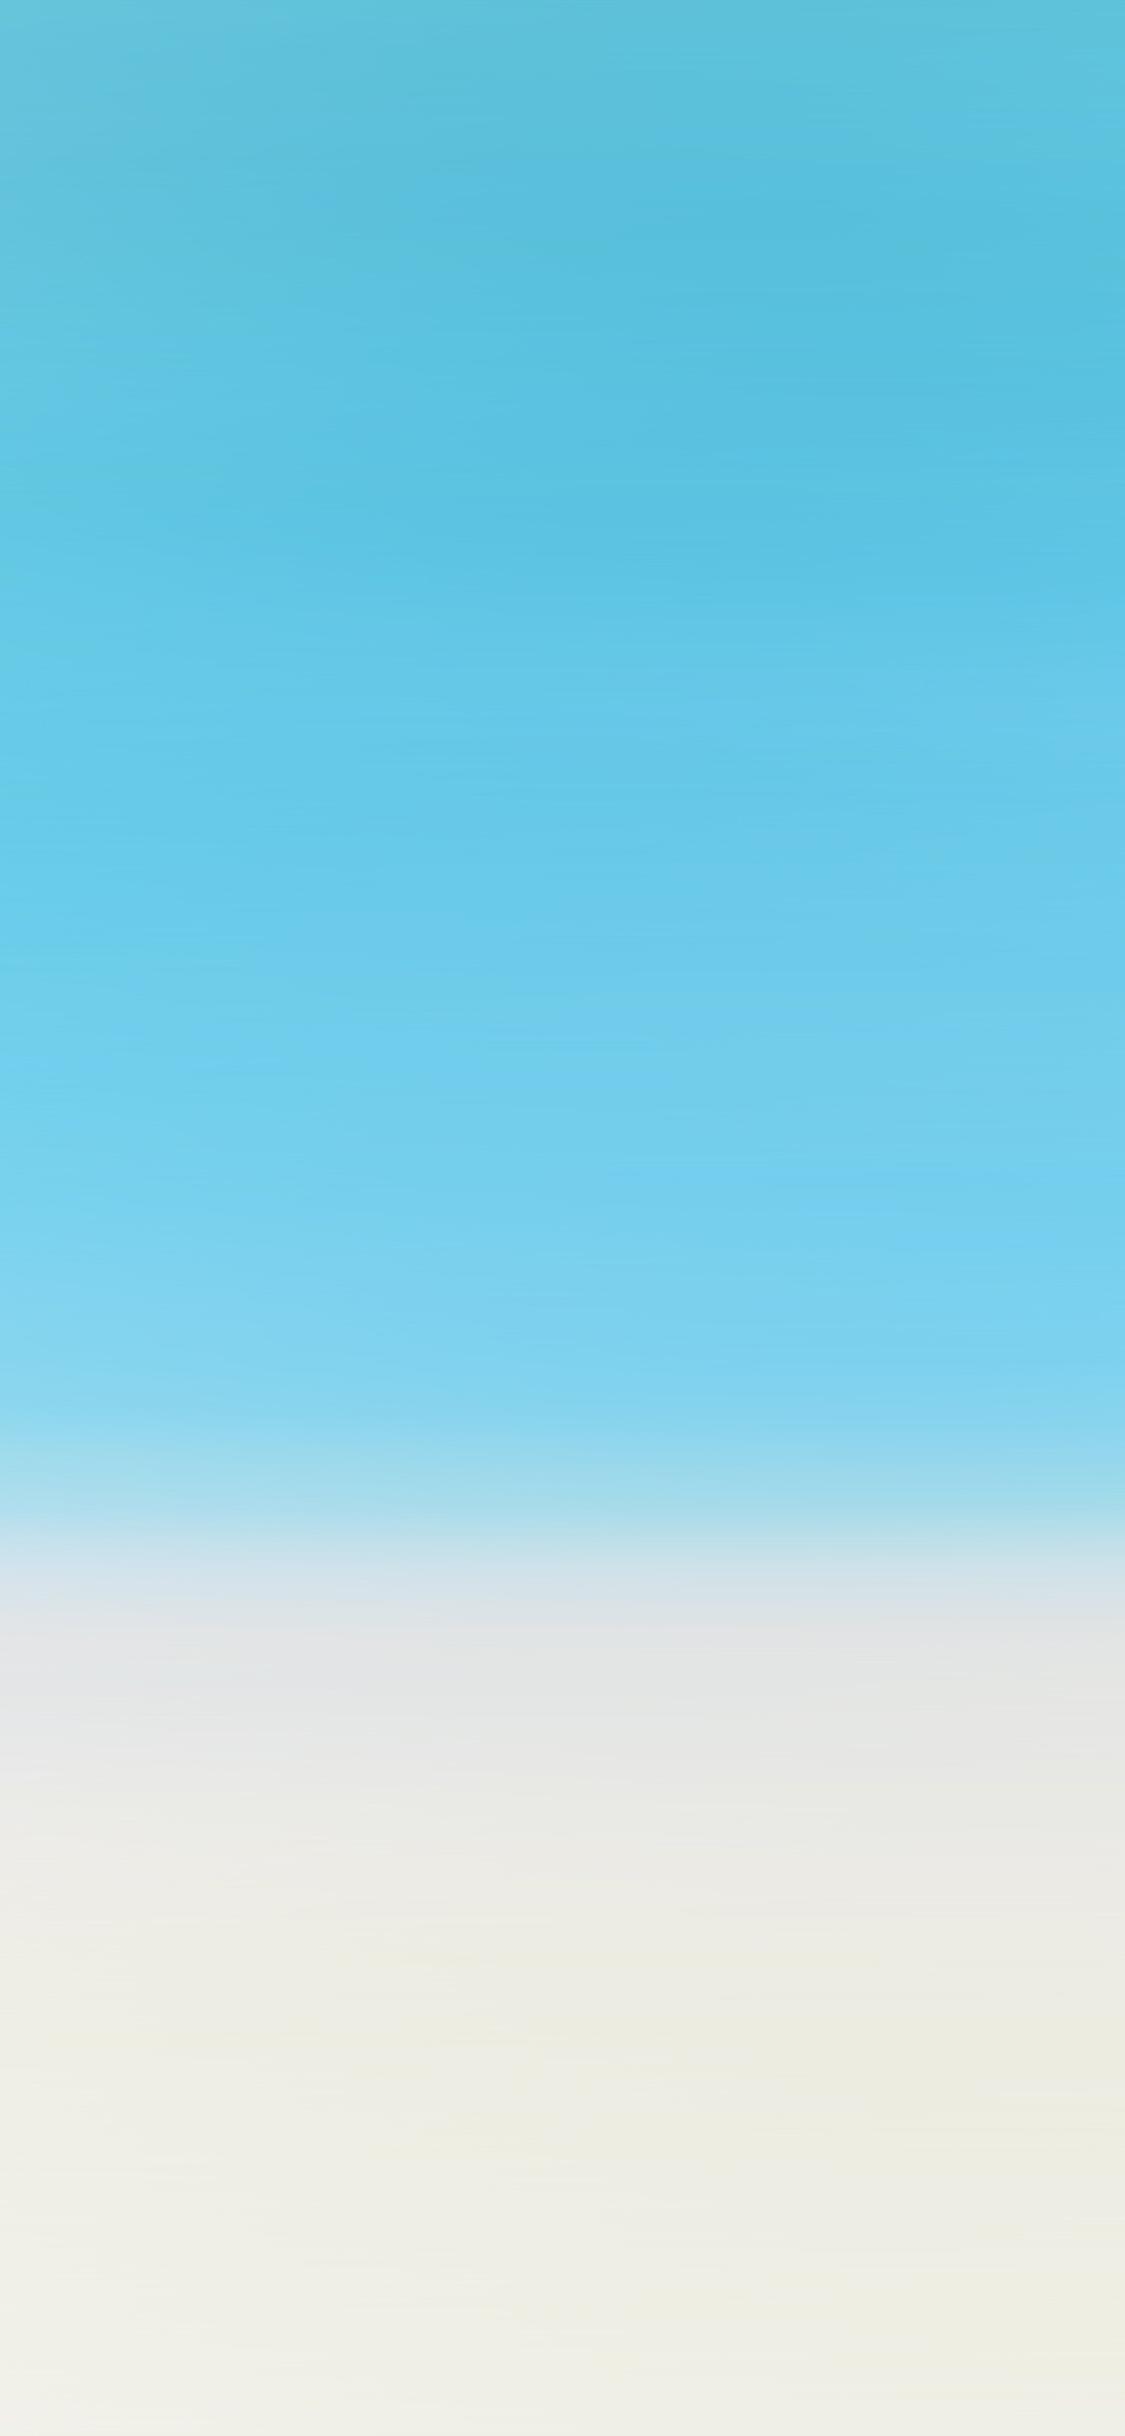 iPhoneXpapers.com-Apple-iPhone-wallpaper-sg29-motion-sky-blue-white-gradation-blur